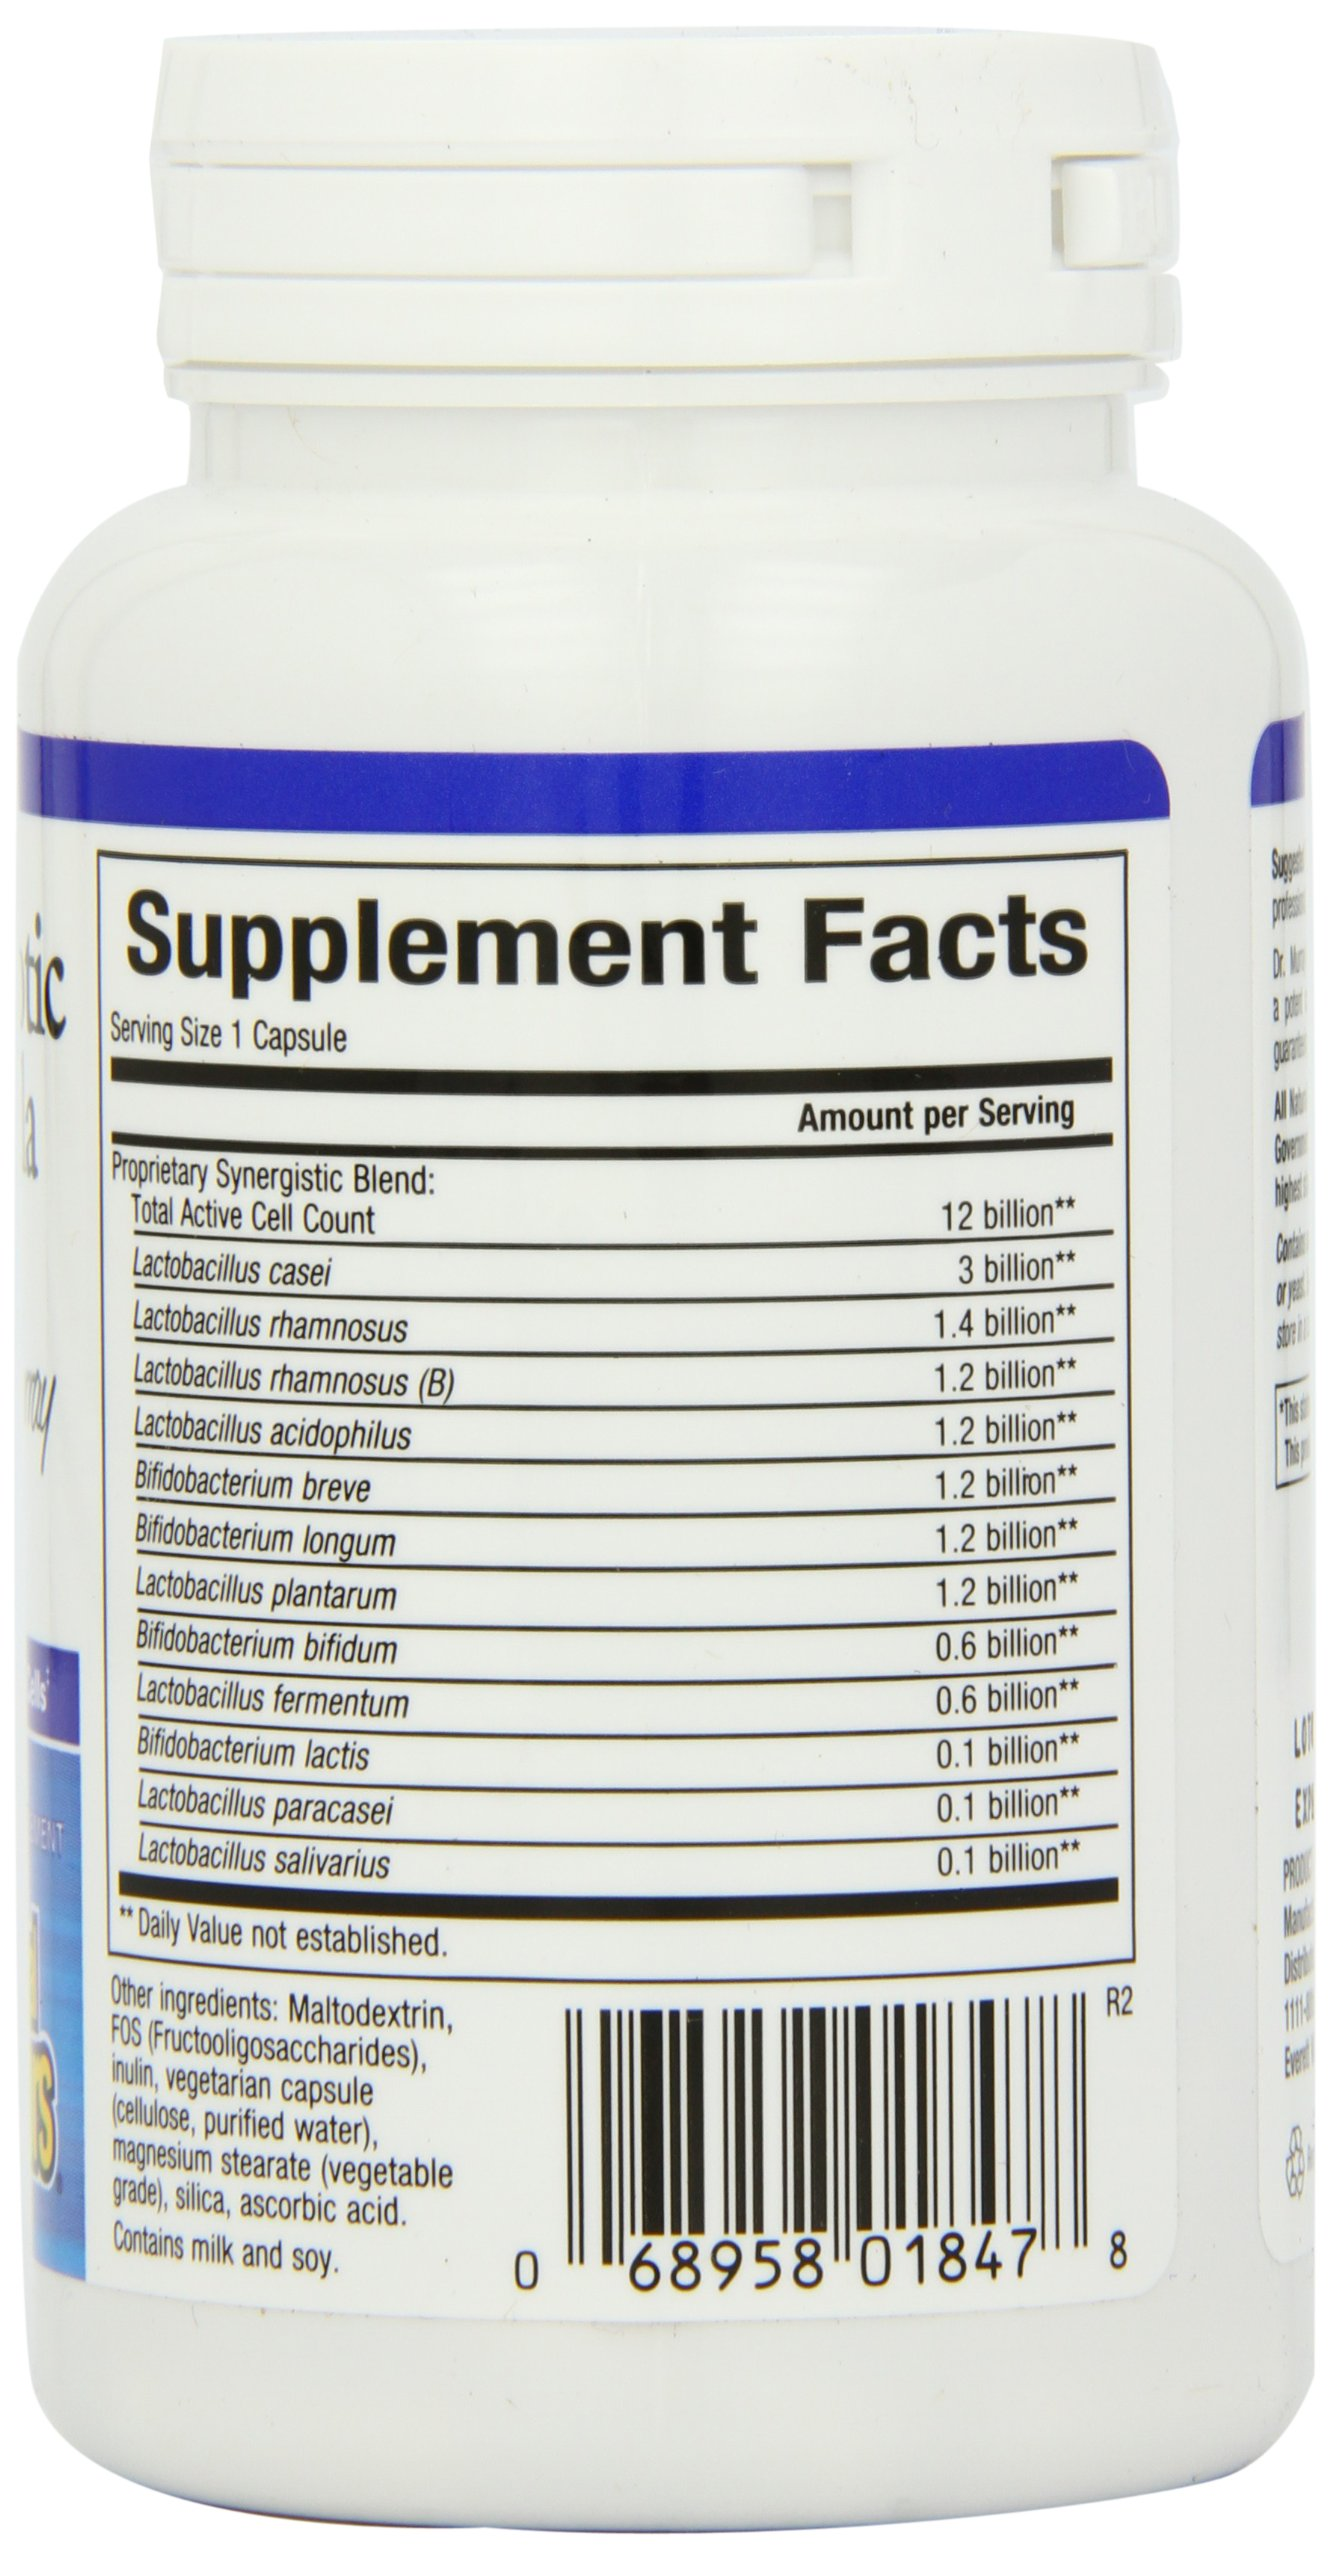 Natural Factors - Ultimate Probiotic 12/12 Formula, Supports Intestinal & Digestive Health, 60 Vegetarian Capsules